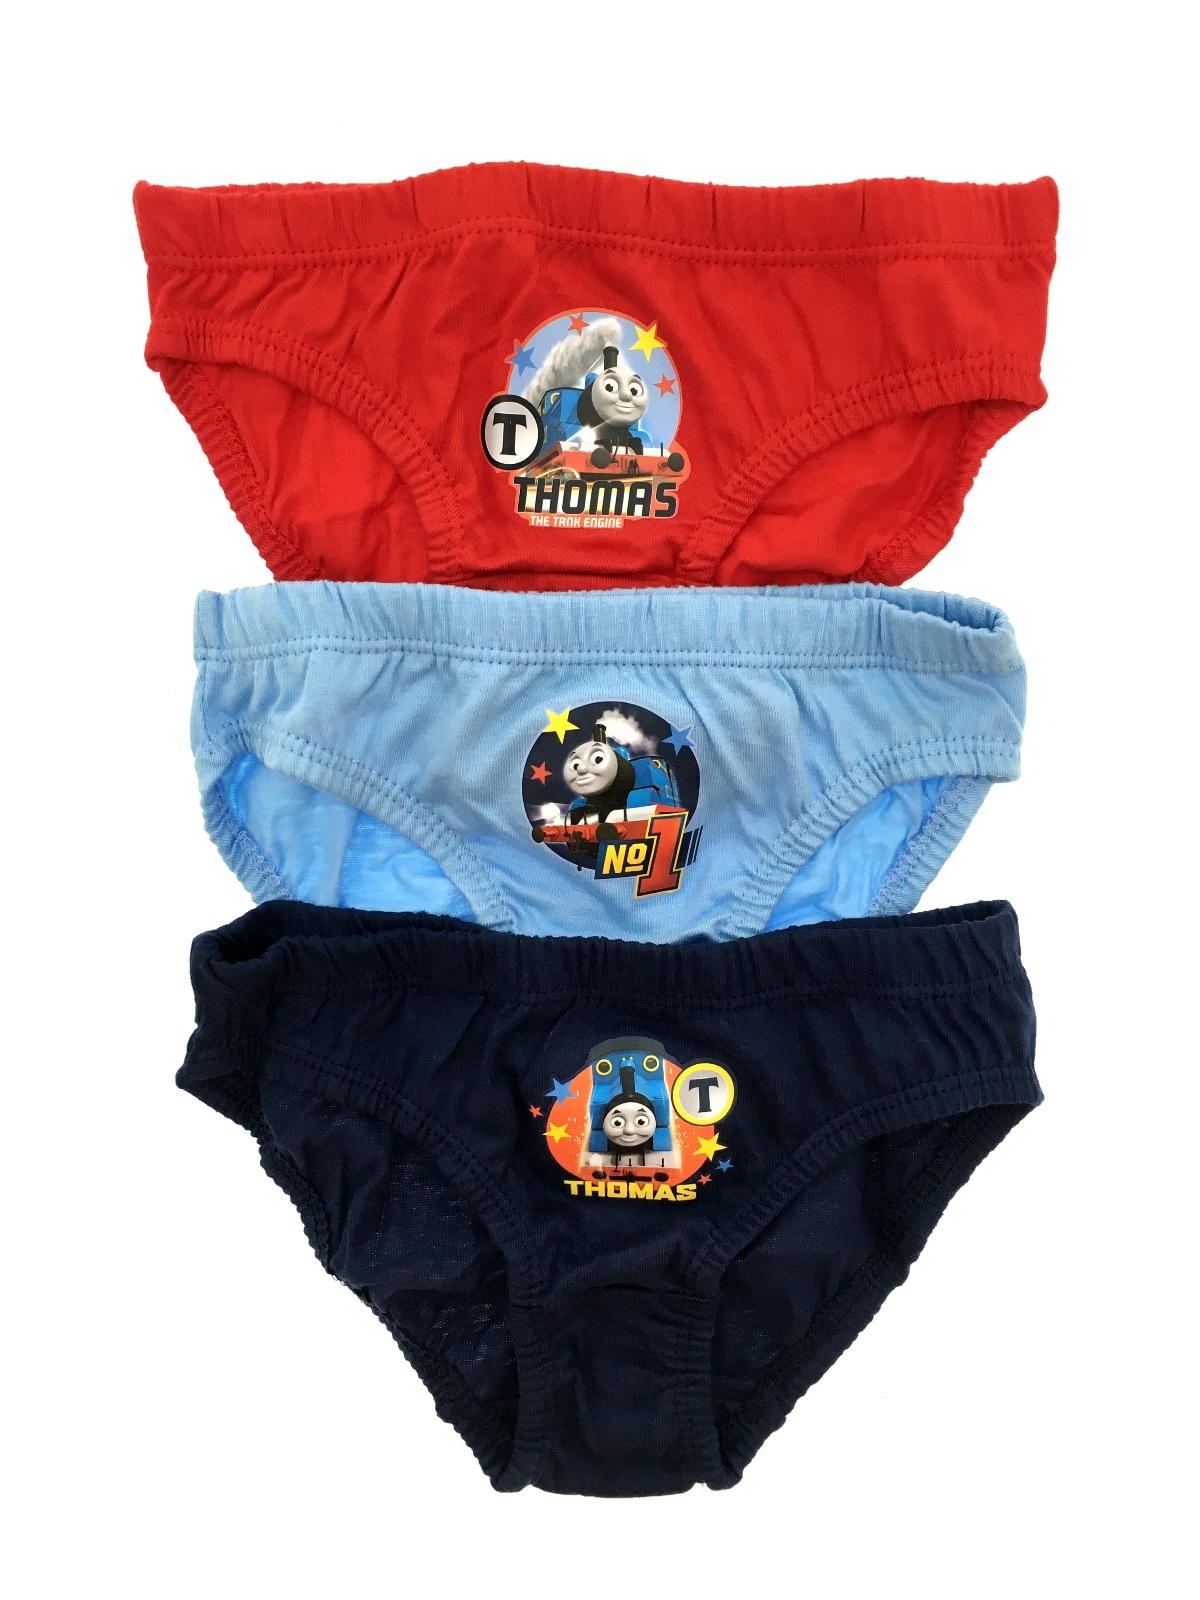 Thomas The Tank Boys Thomas The Tank Engine Underwear